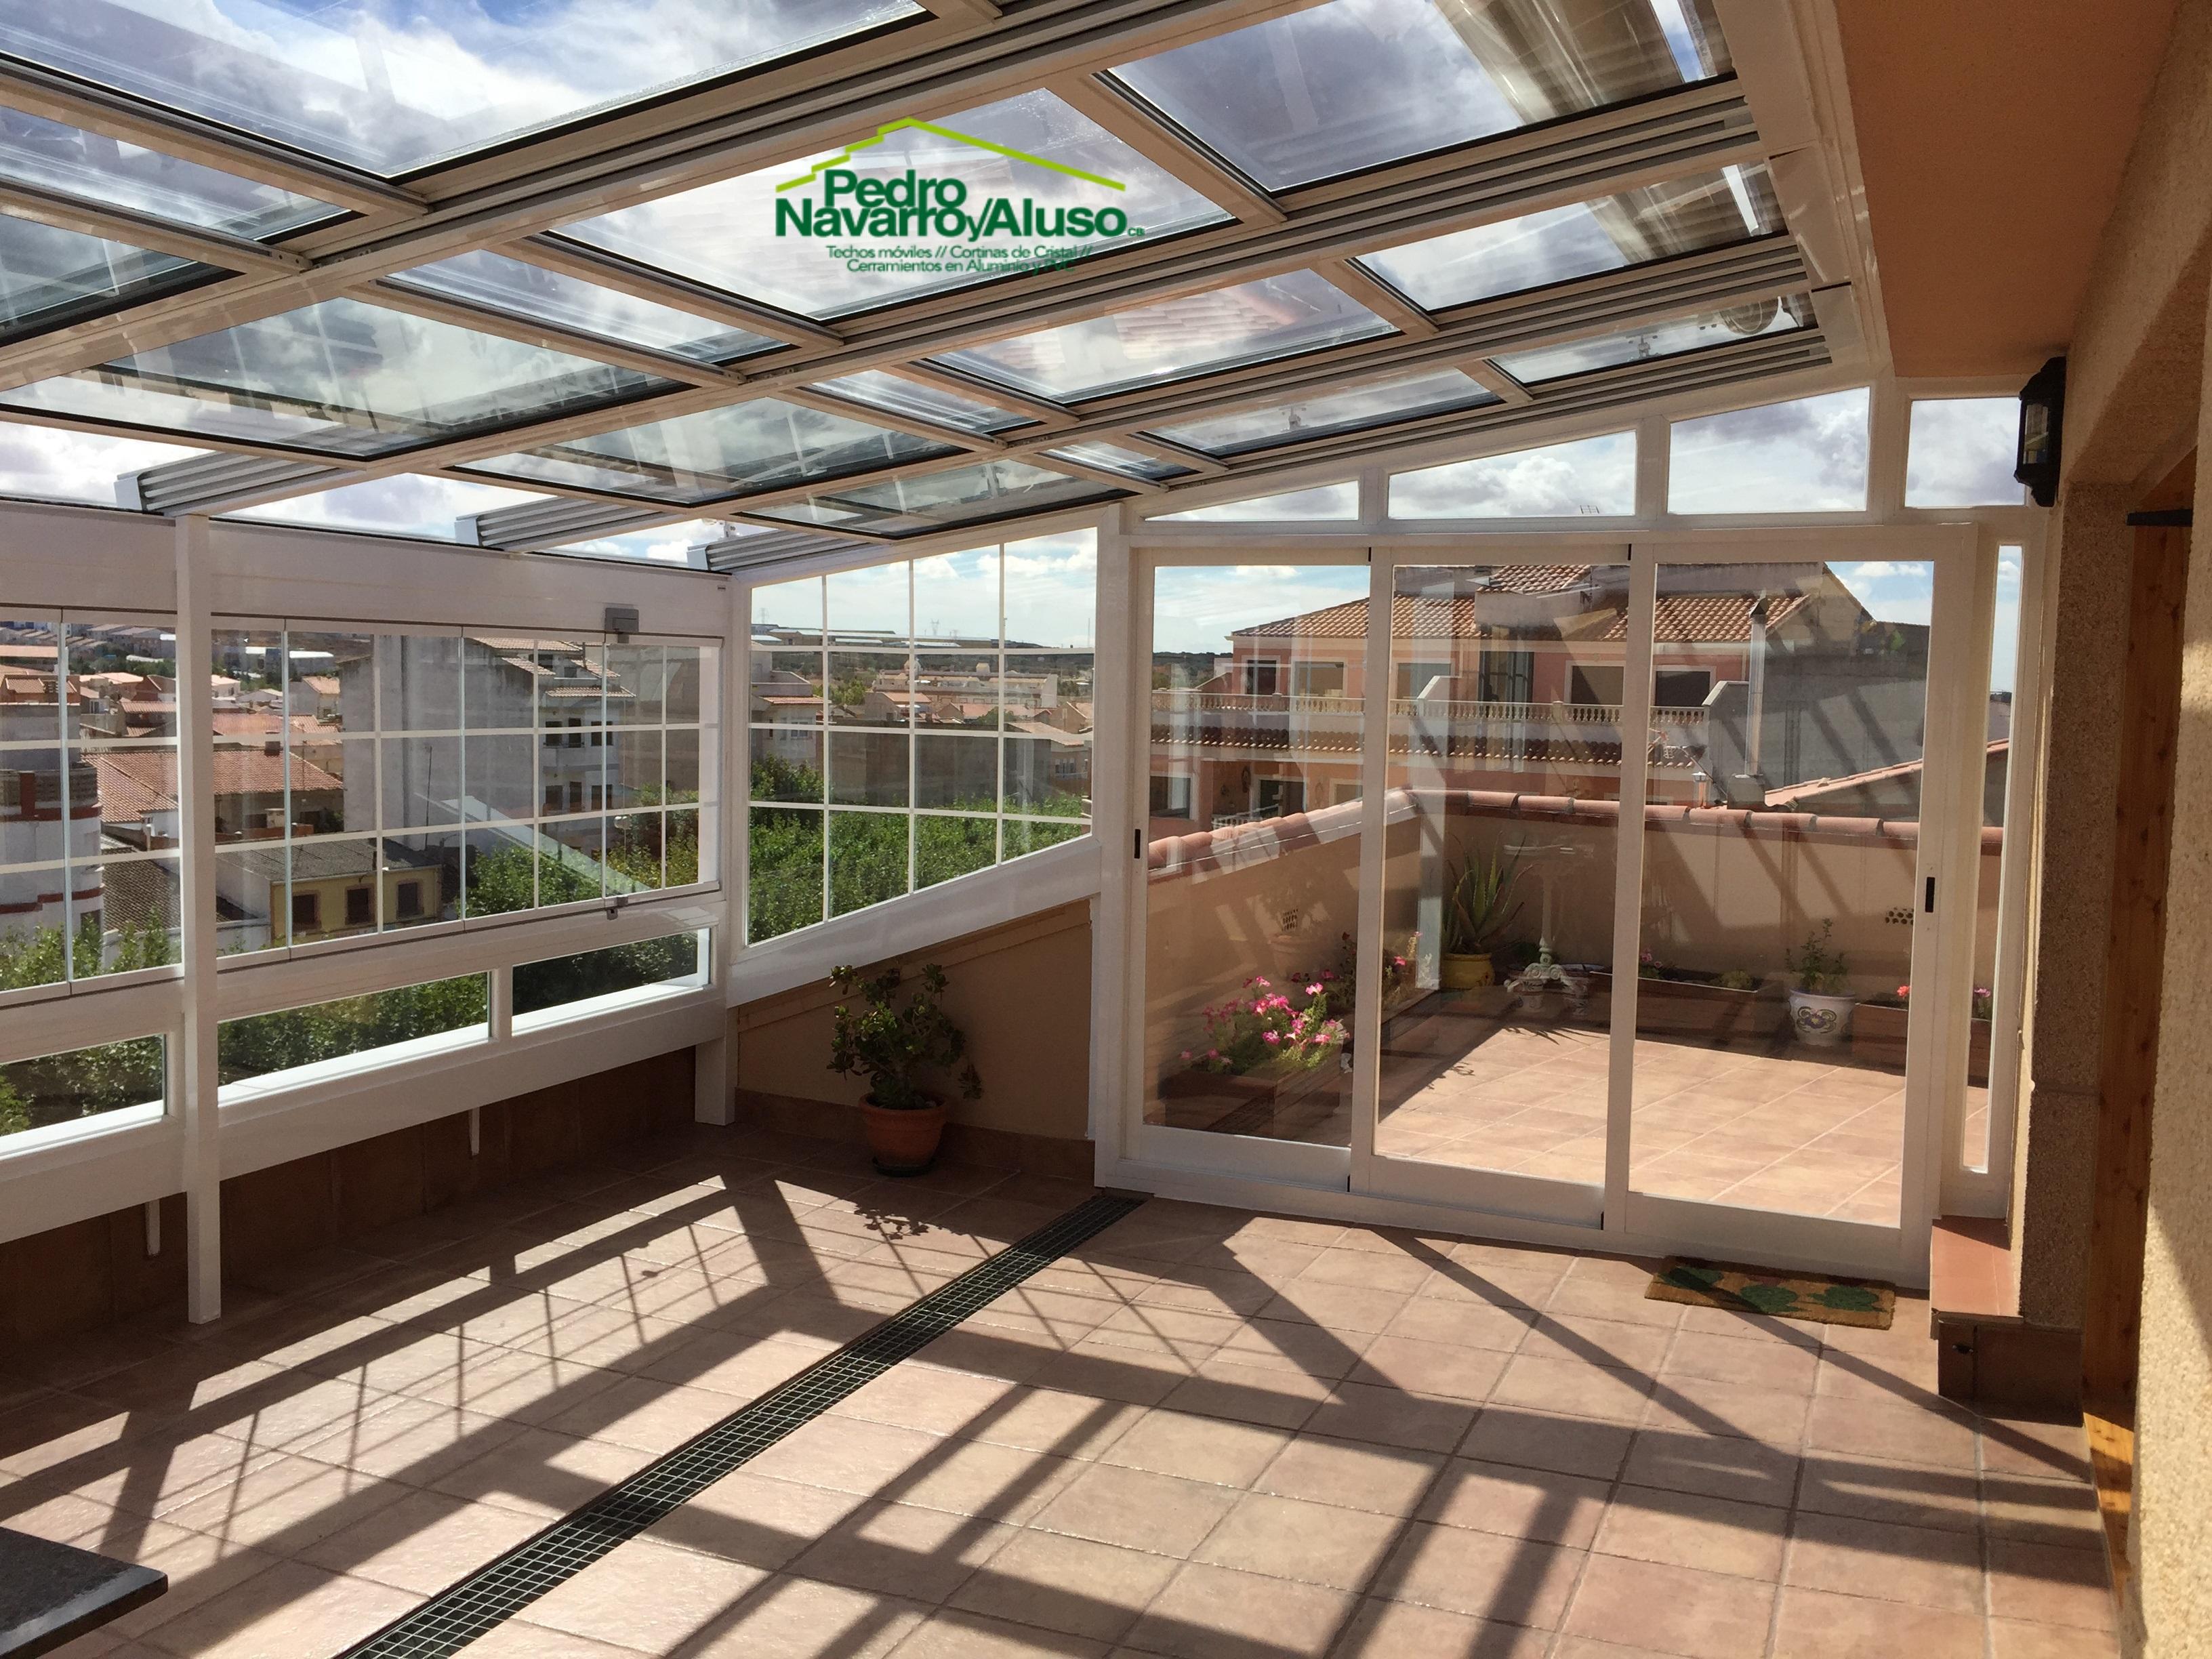 techo-movil-toldo-veranda-cortinas-cristal-5